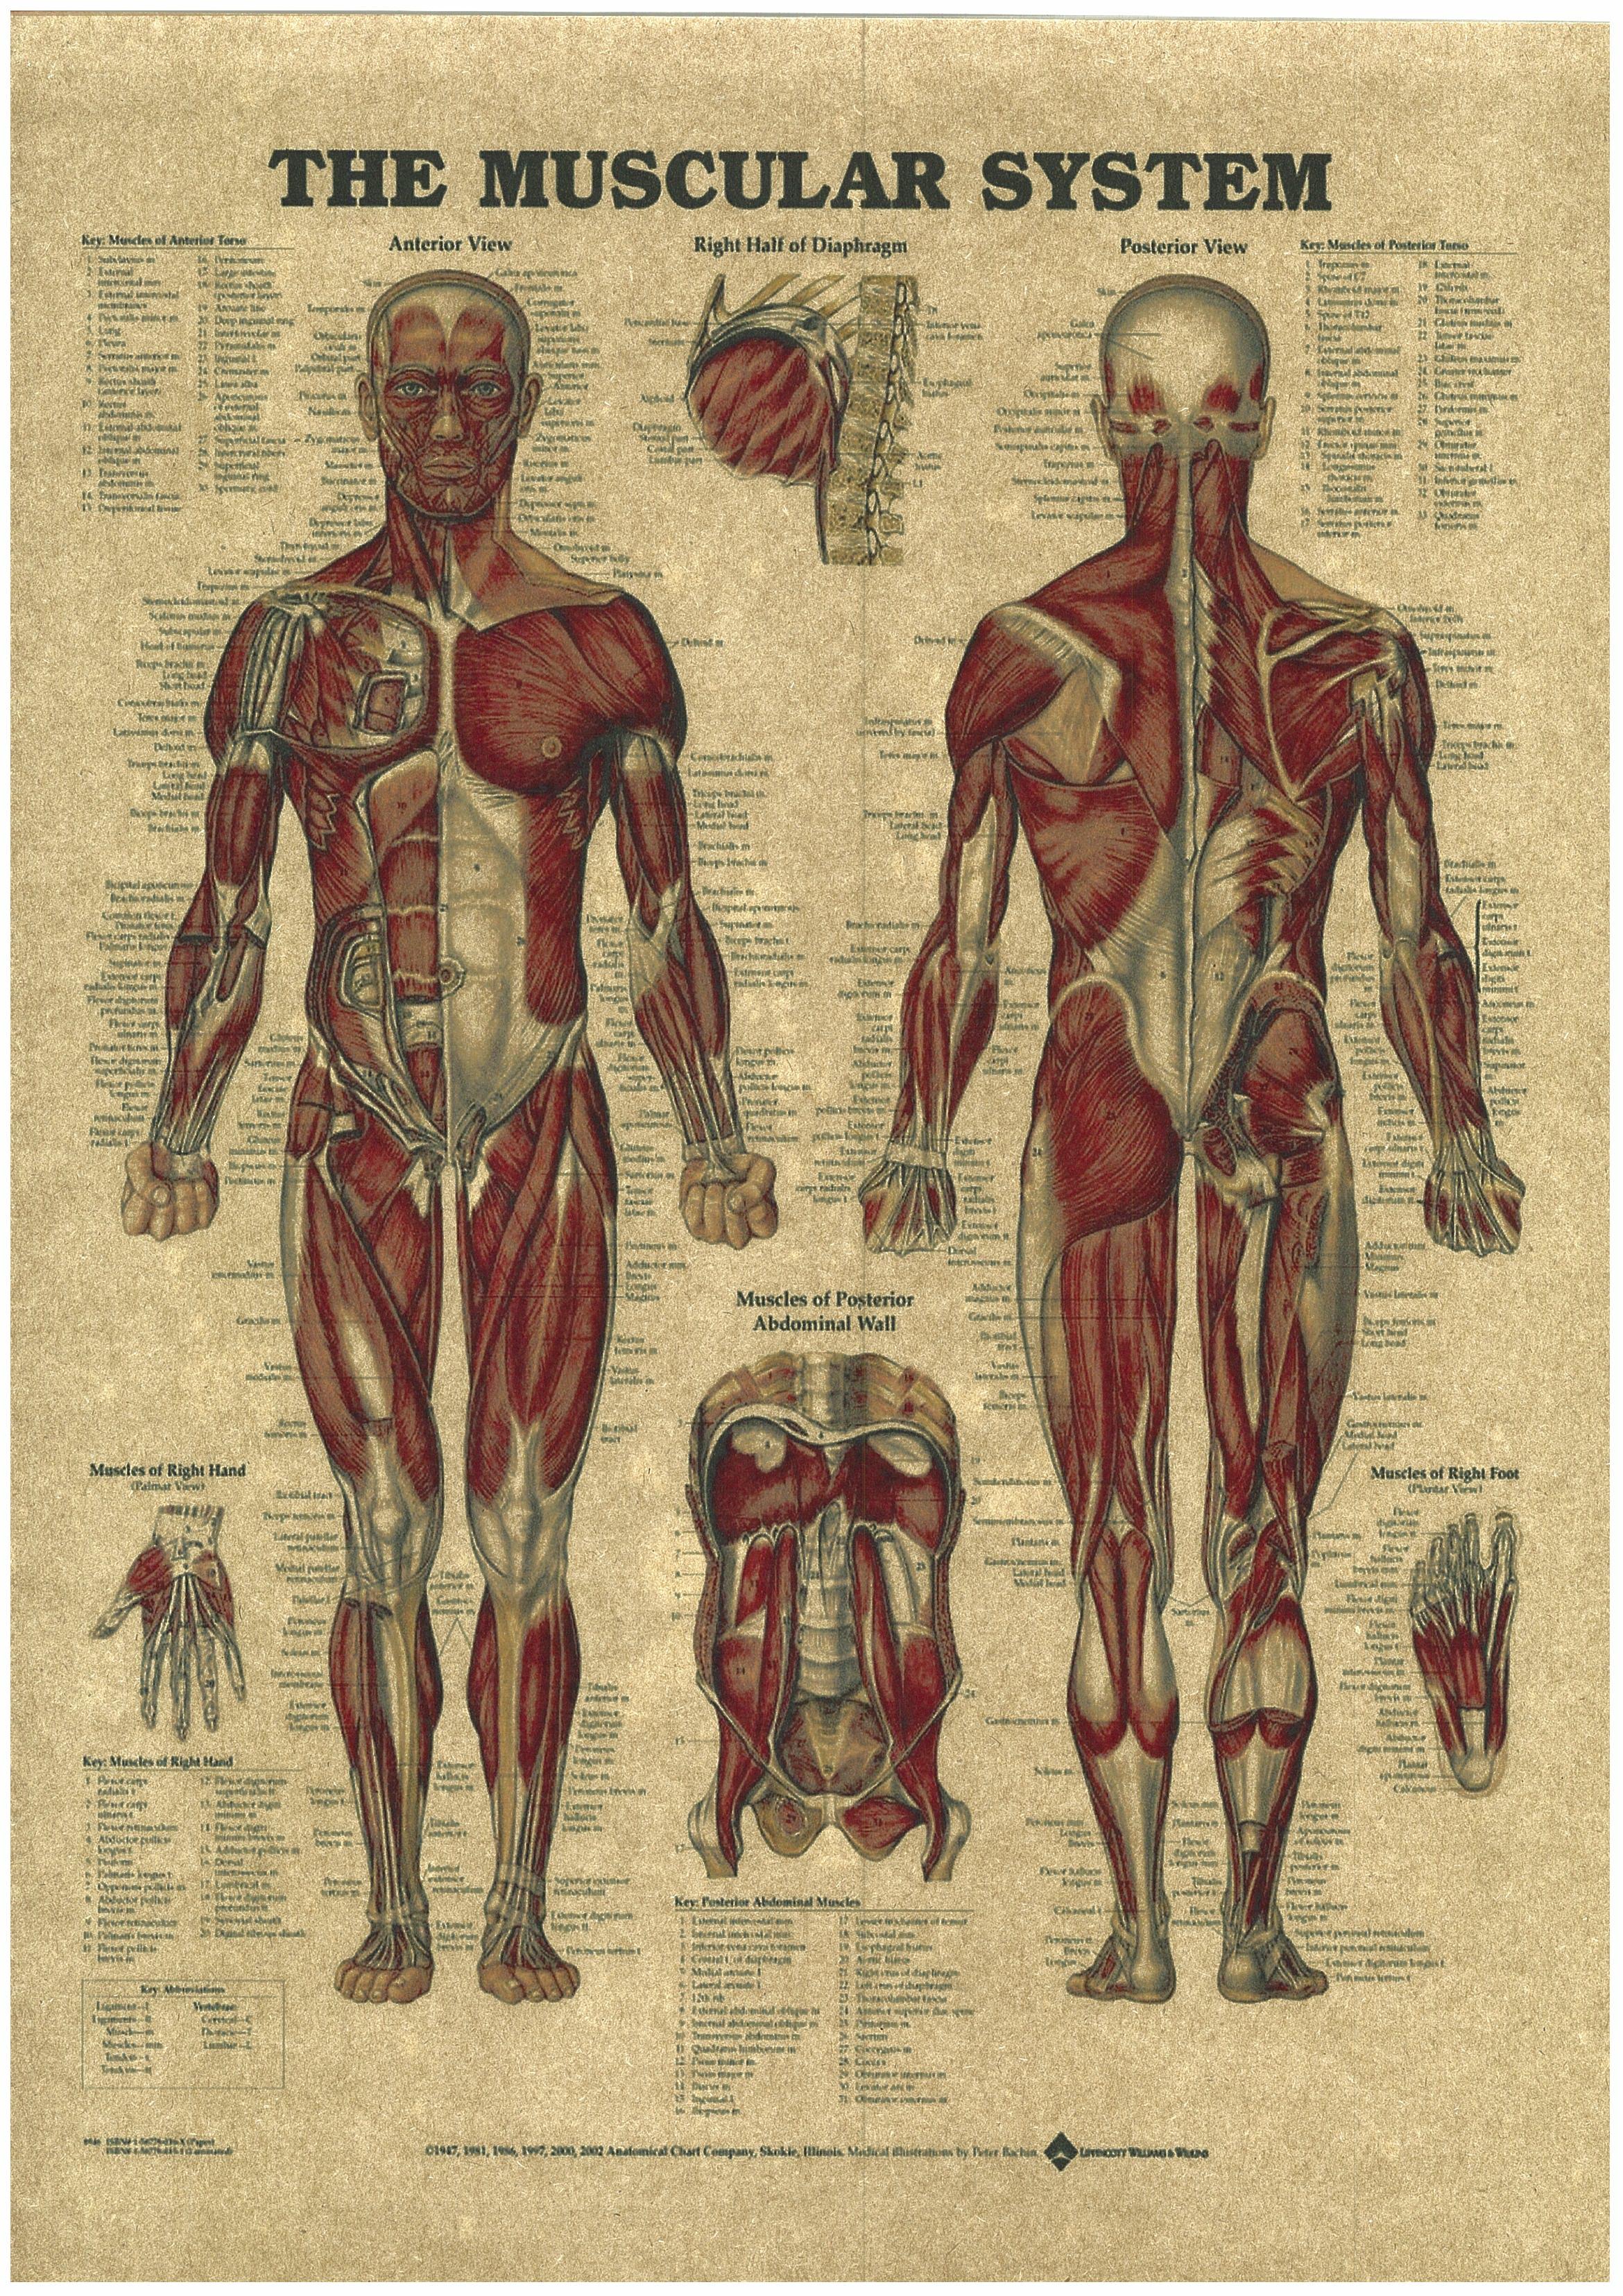 Human Anatomy Retro Medicine Posters Kraft Paper Painting Wall ...